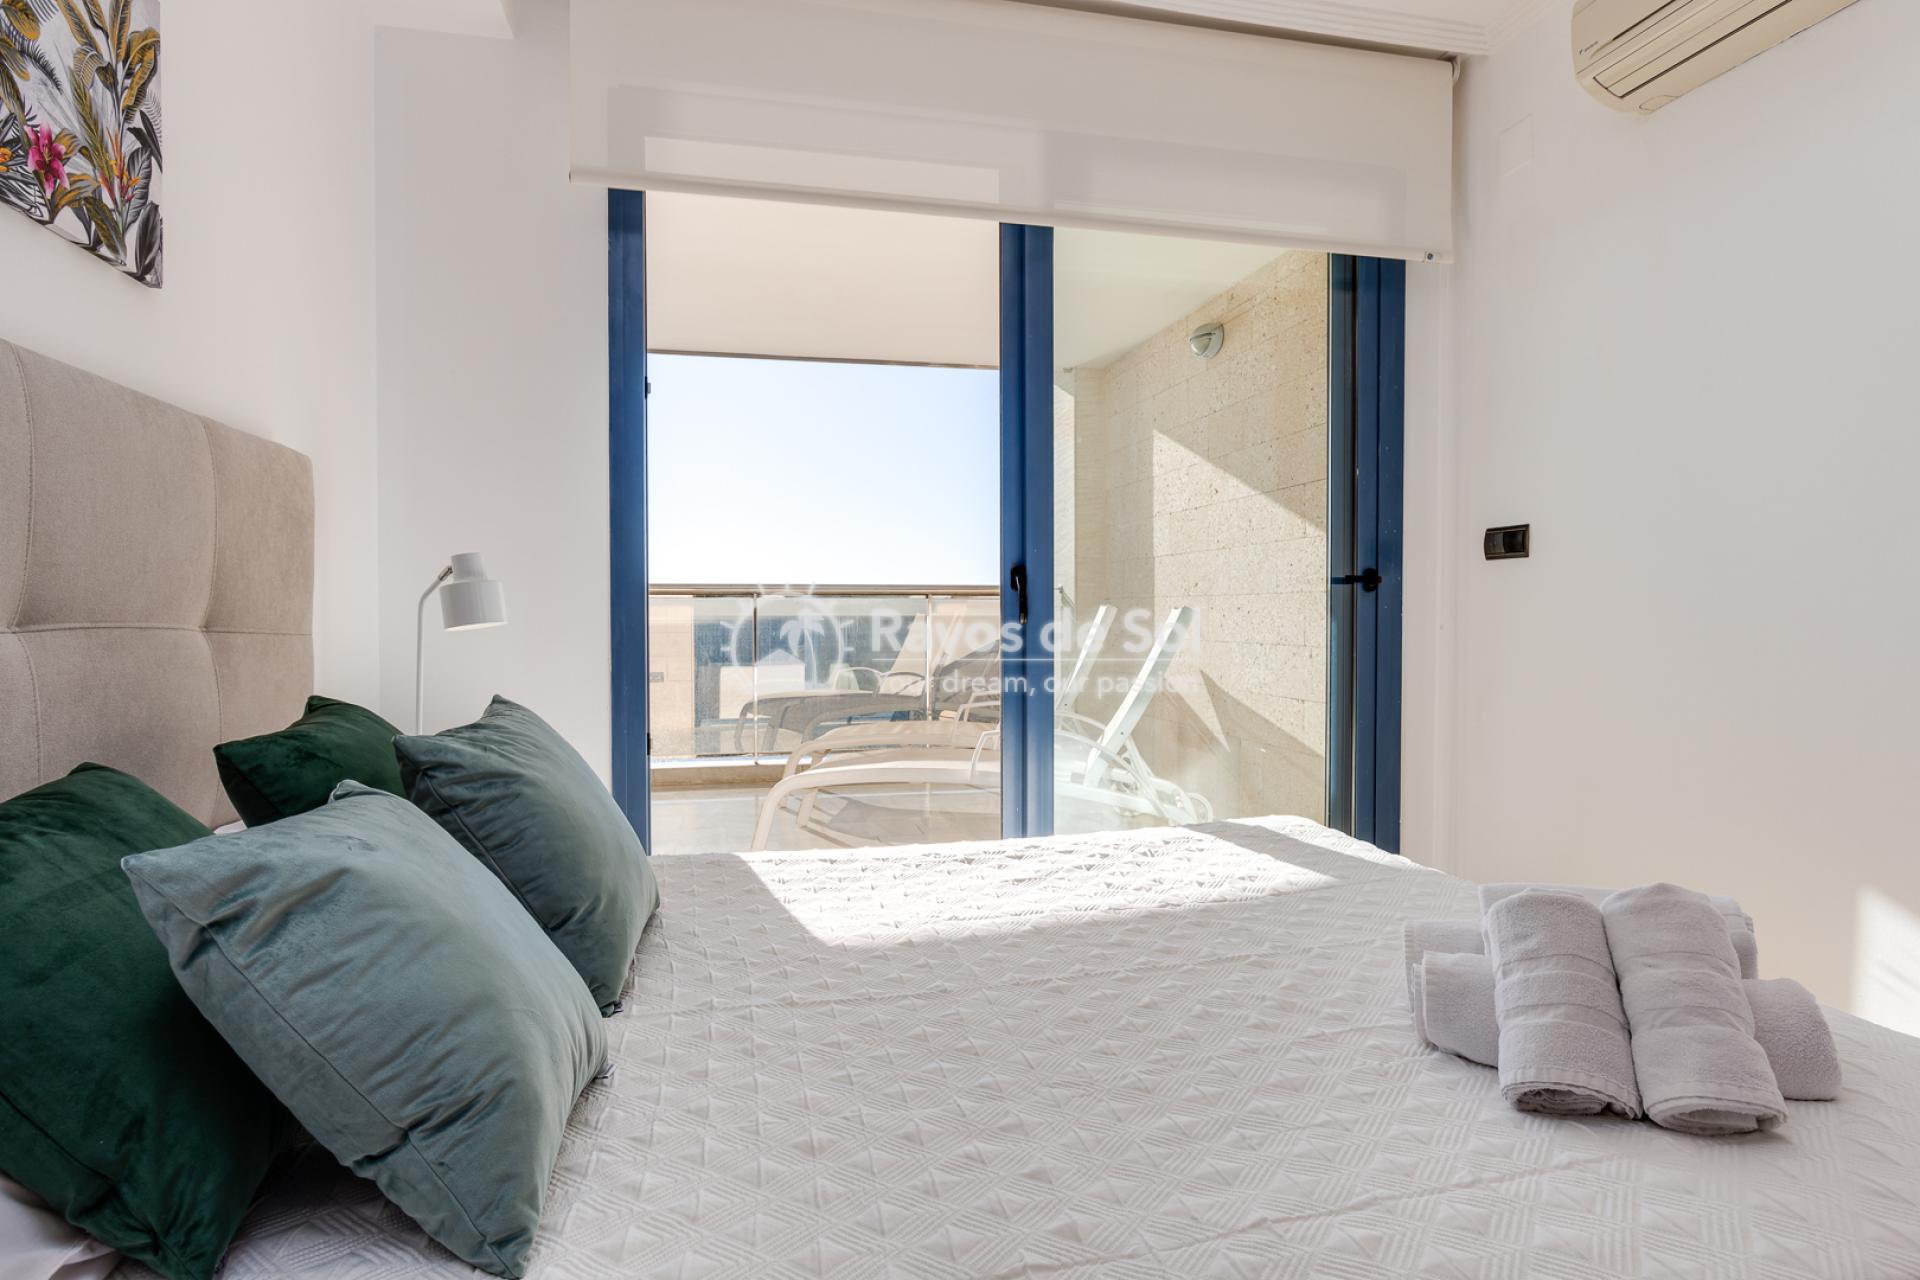 Turnekey first line apartments  in Altea, Costa Blanca (Alteabeach) - 30